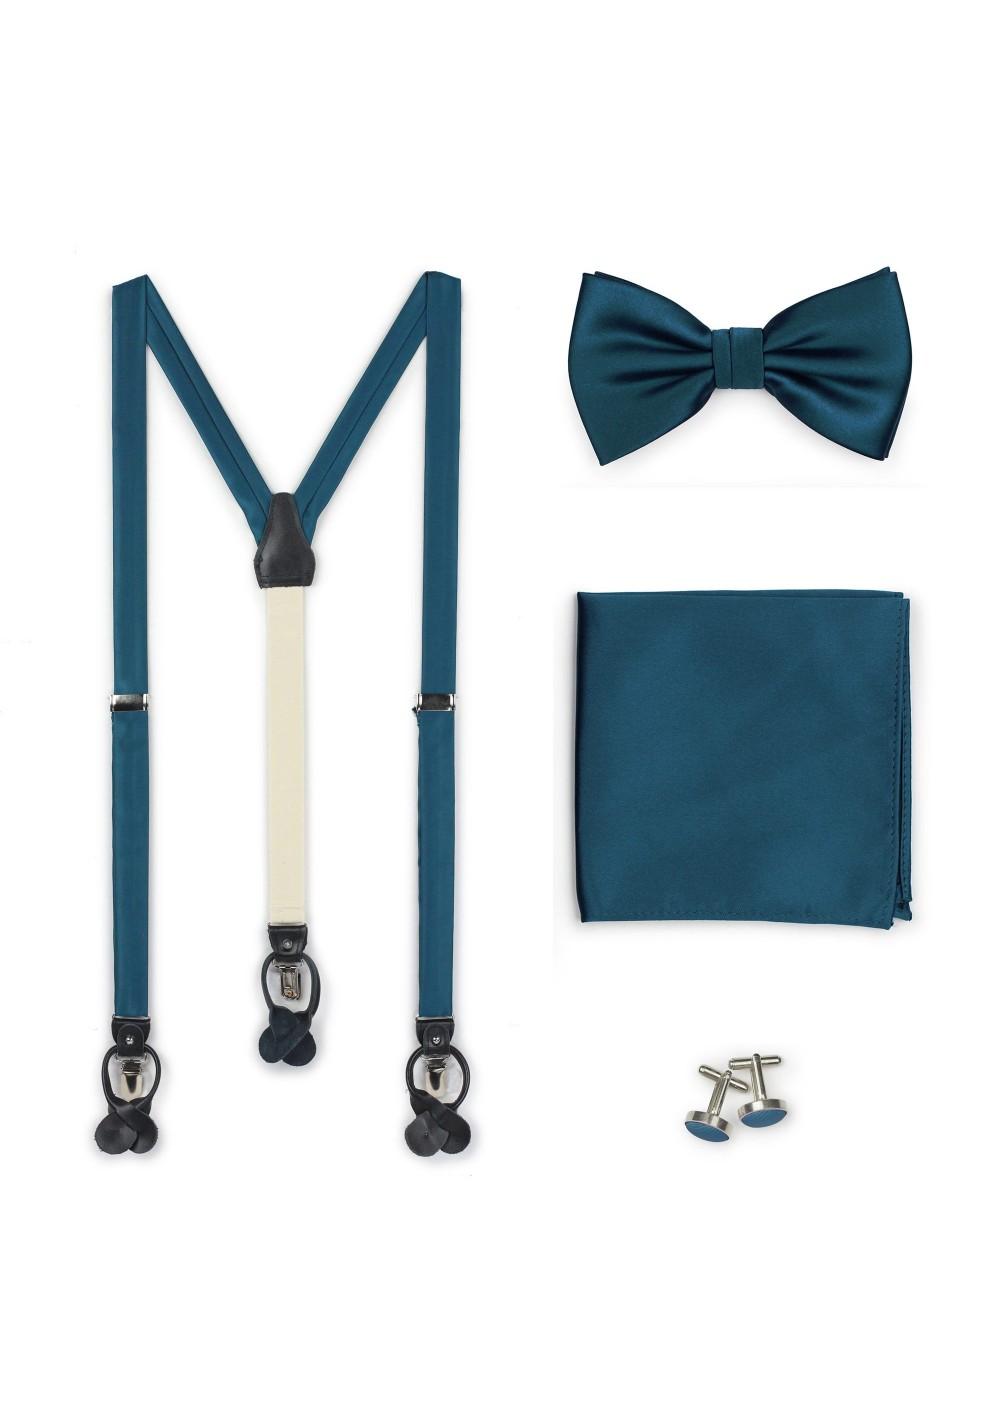 Suspender Bow Tie Gift Set in Teal Blue